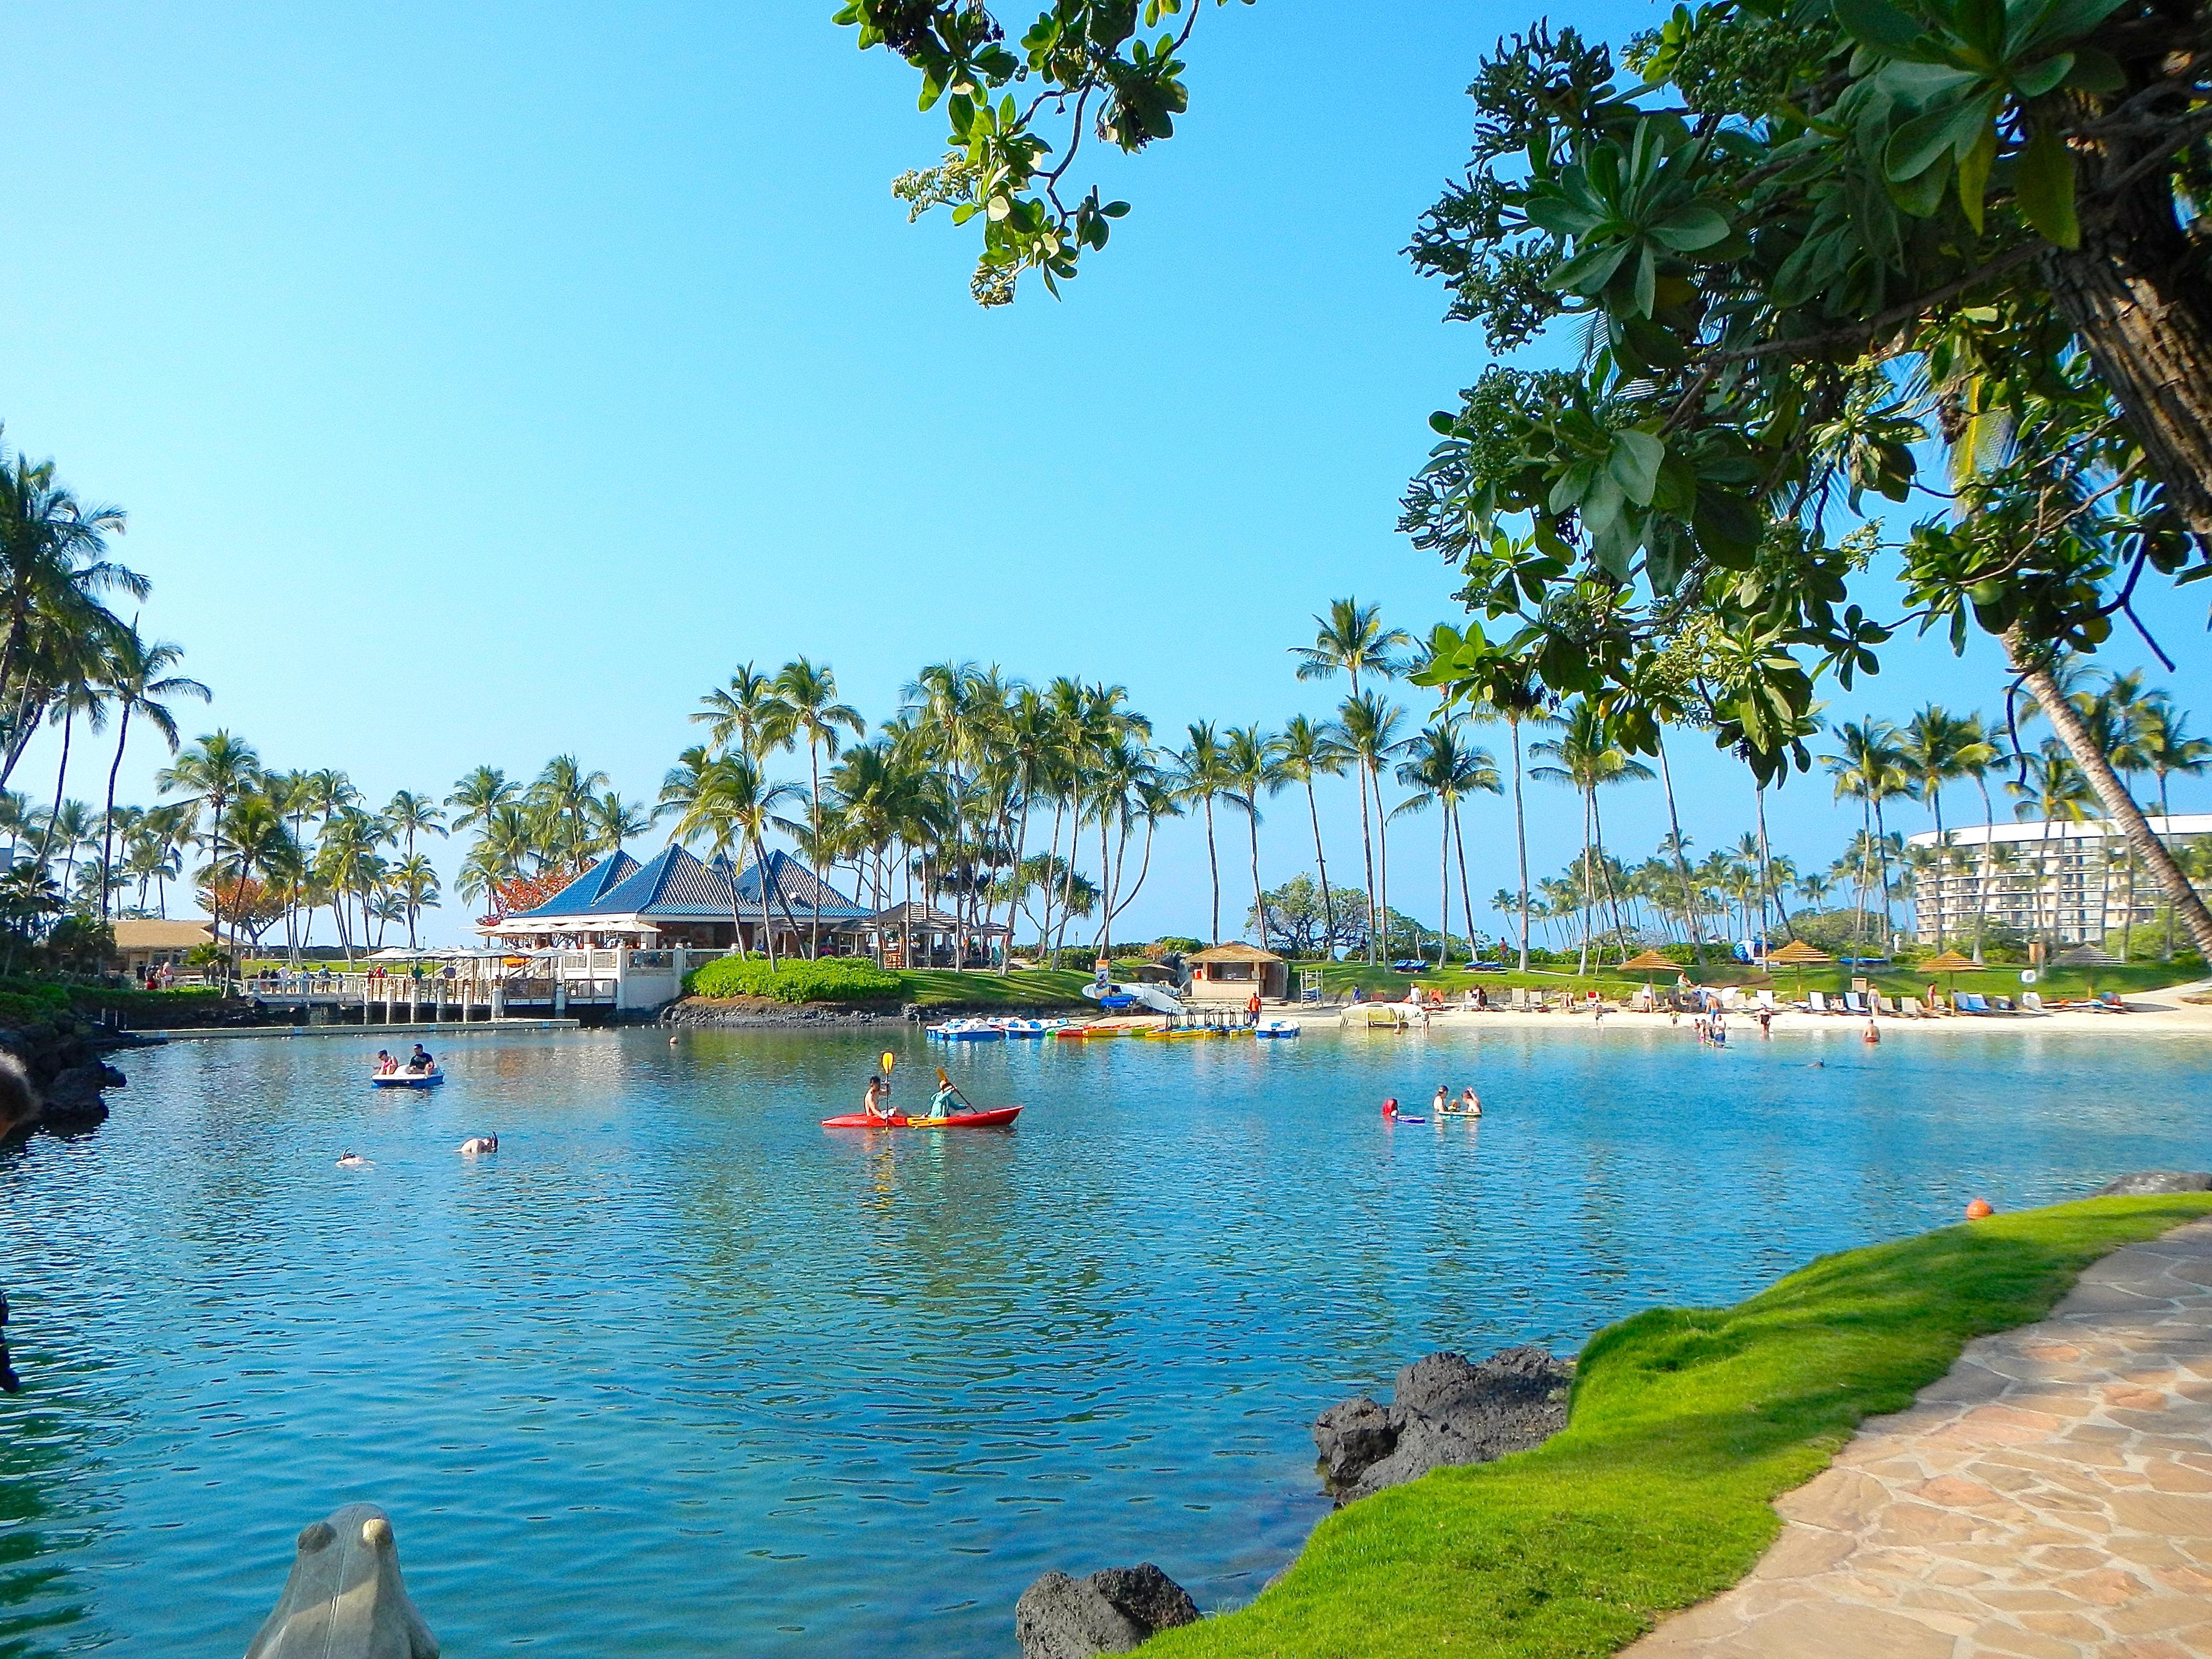 Saltwater Lagoon at Hilton's Waikola Village Resort